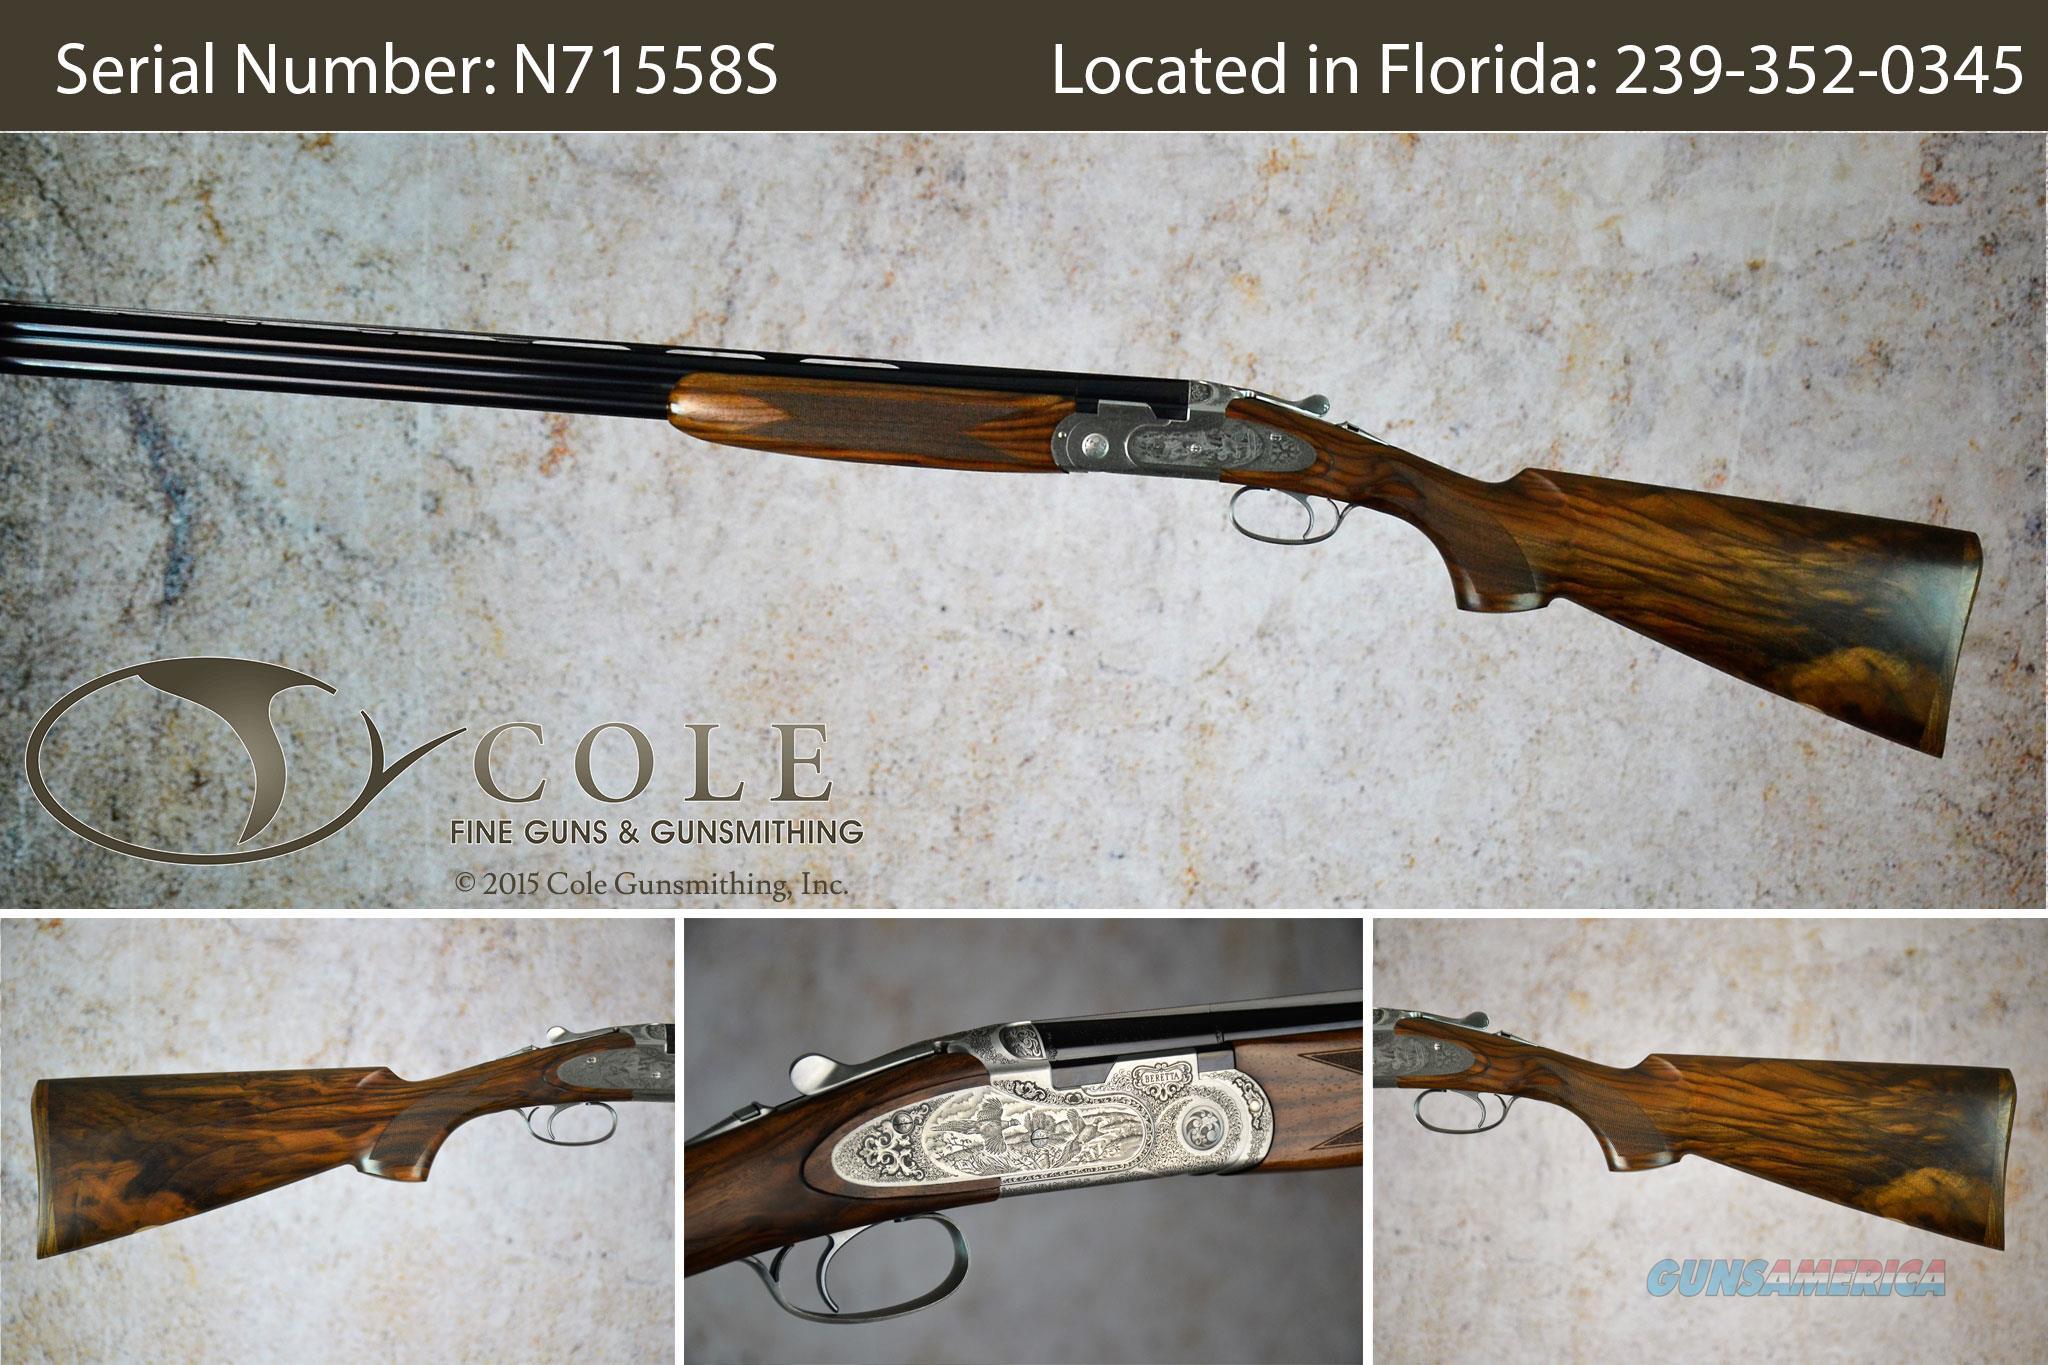 "Beretta 687 EELL Diamond Pigeon Field 20g 28"" SN:#N71558S  Guns > Shotguns > Beretta Shotguns > O/U > Hunting"